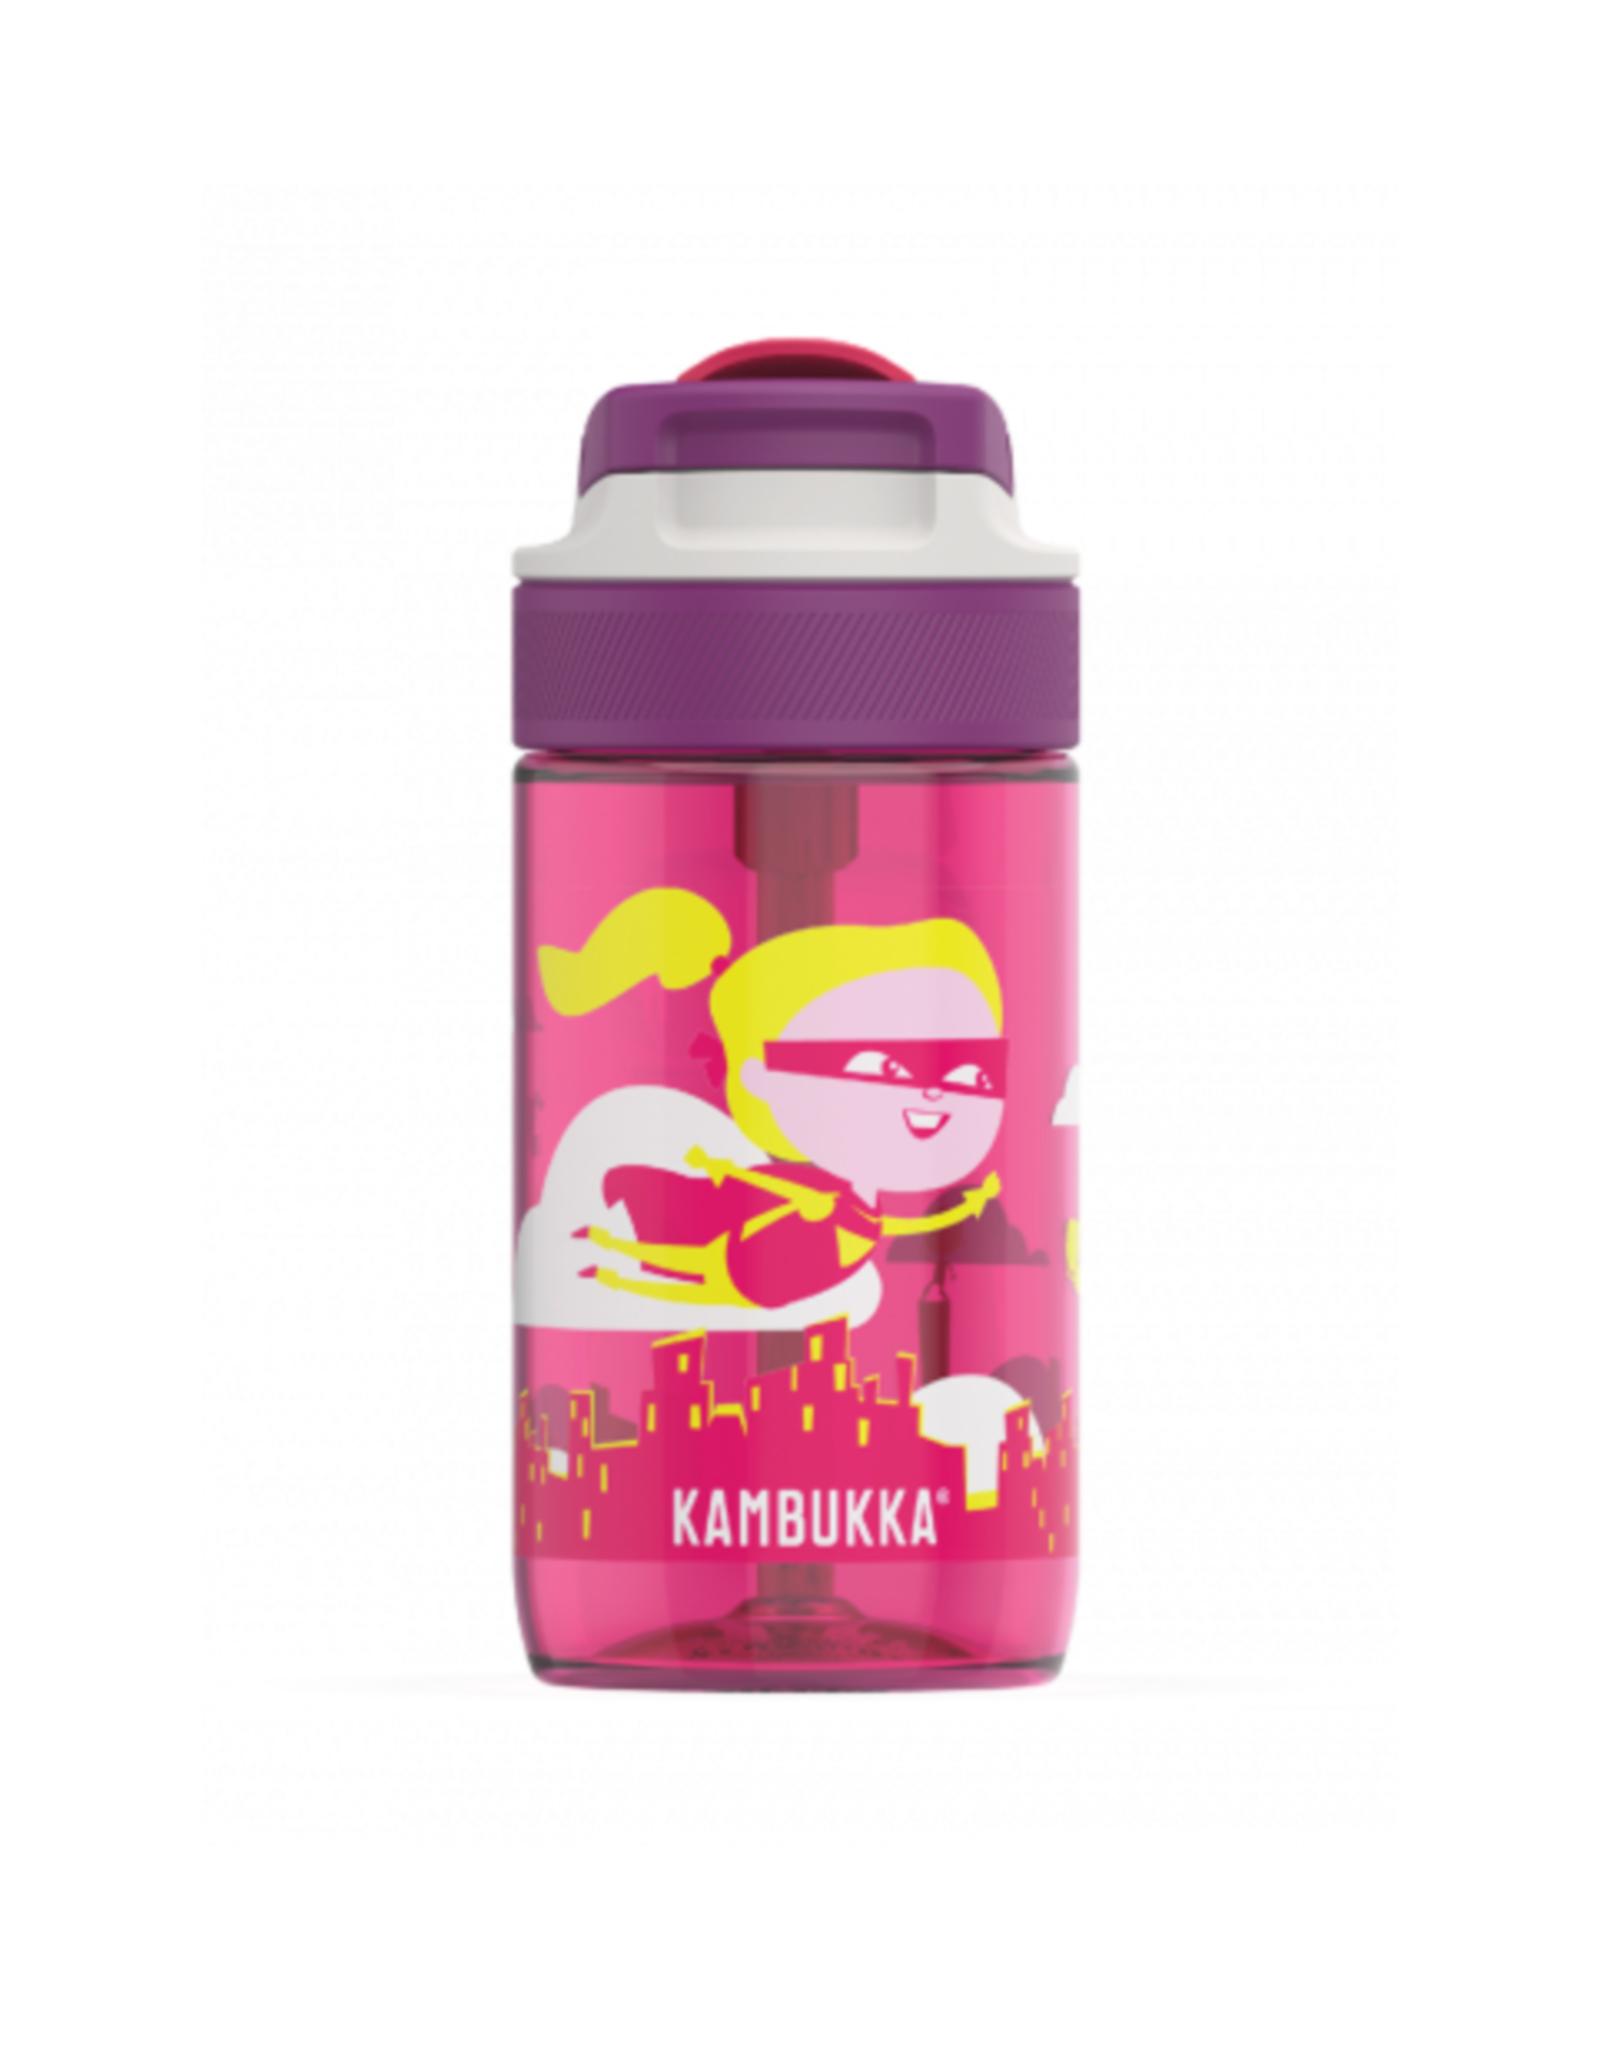 Kambukka Lagoon Flying supergirl - 400 ml